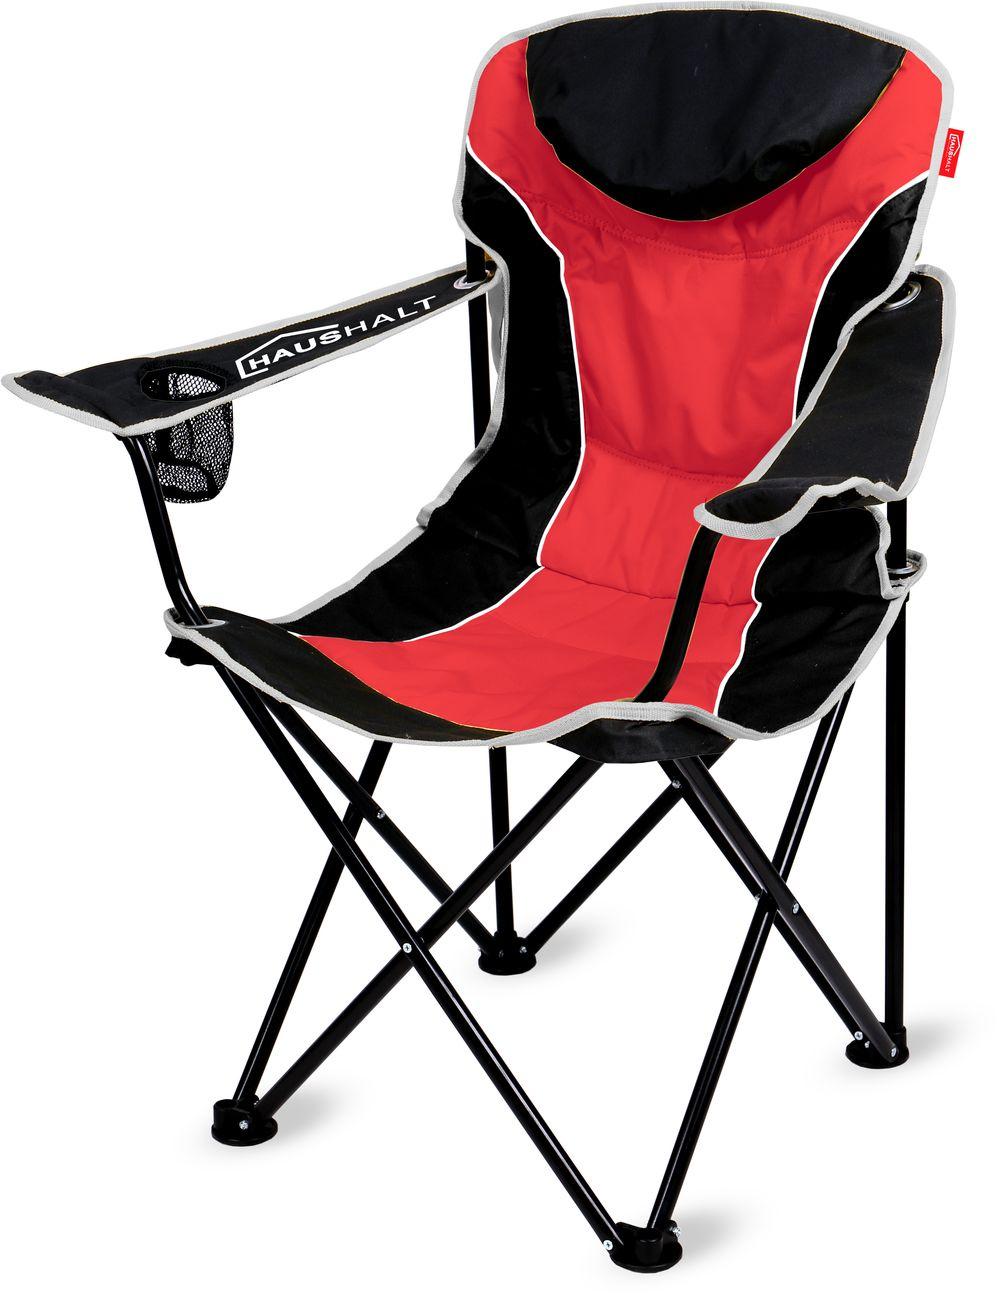 Стул складной Haushalt HHC3/R винный стул складной 400х300х300 мм